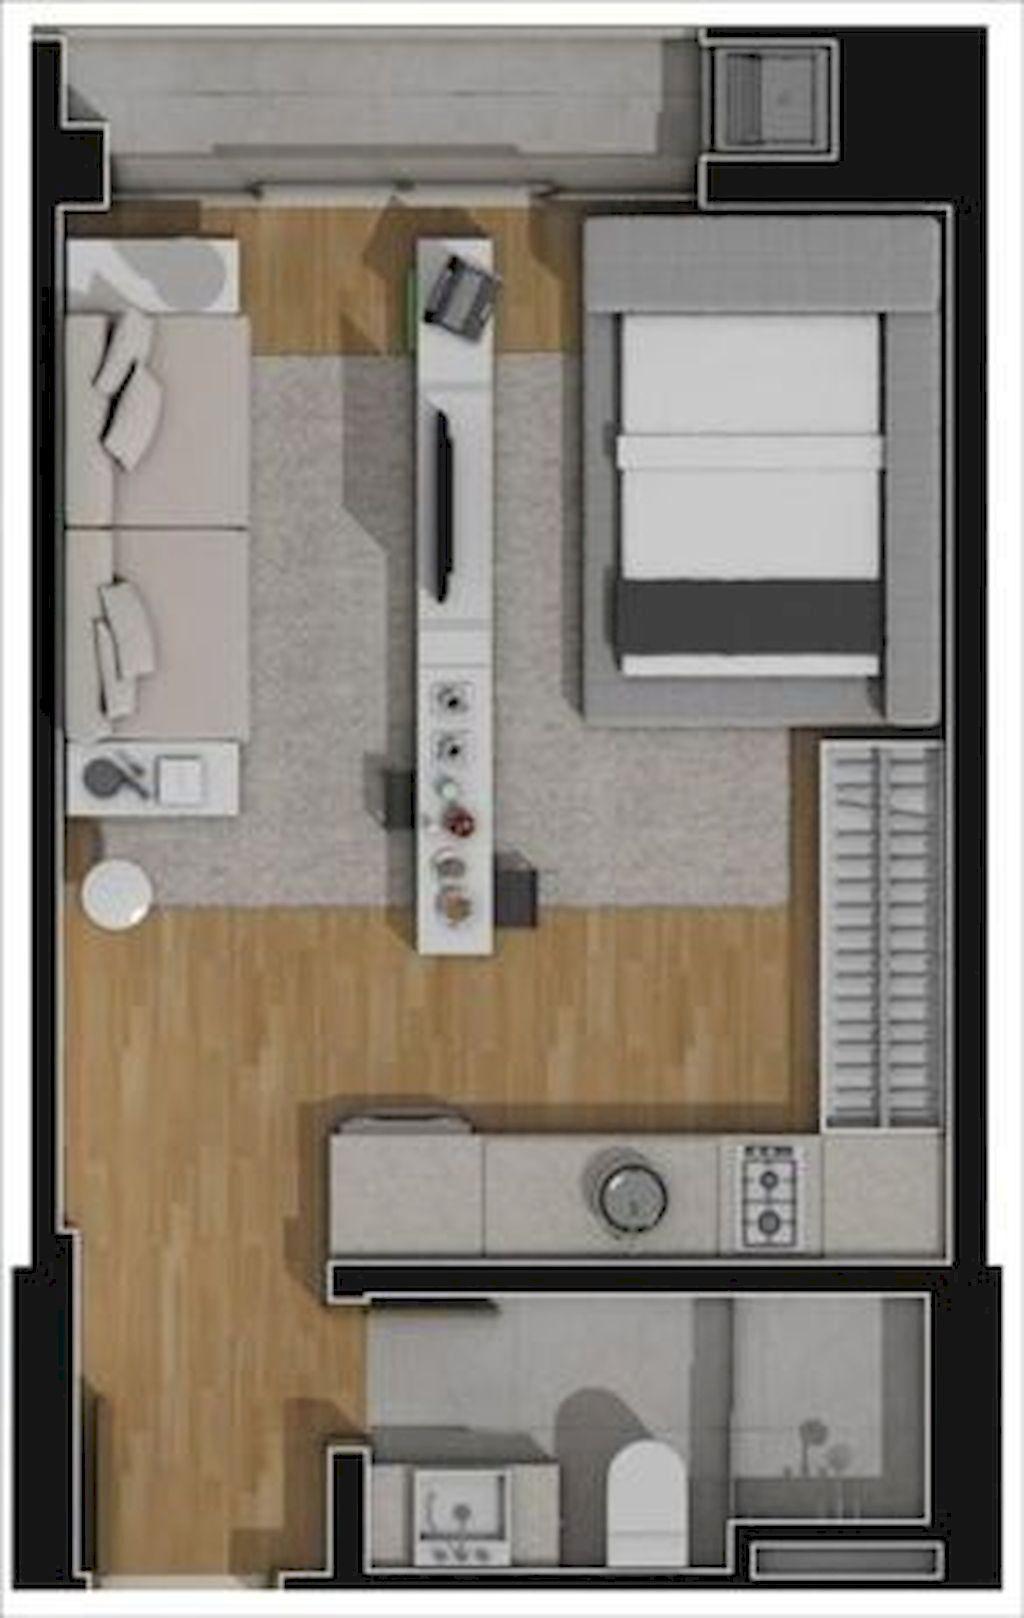 Small Studio Apartment Layout Design Ideas 22 Home Design Apartment Layout Studio Apartment Floor Plans Studio Apartment Layout